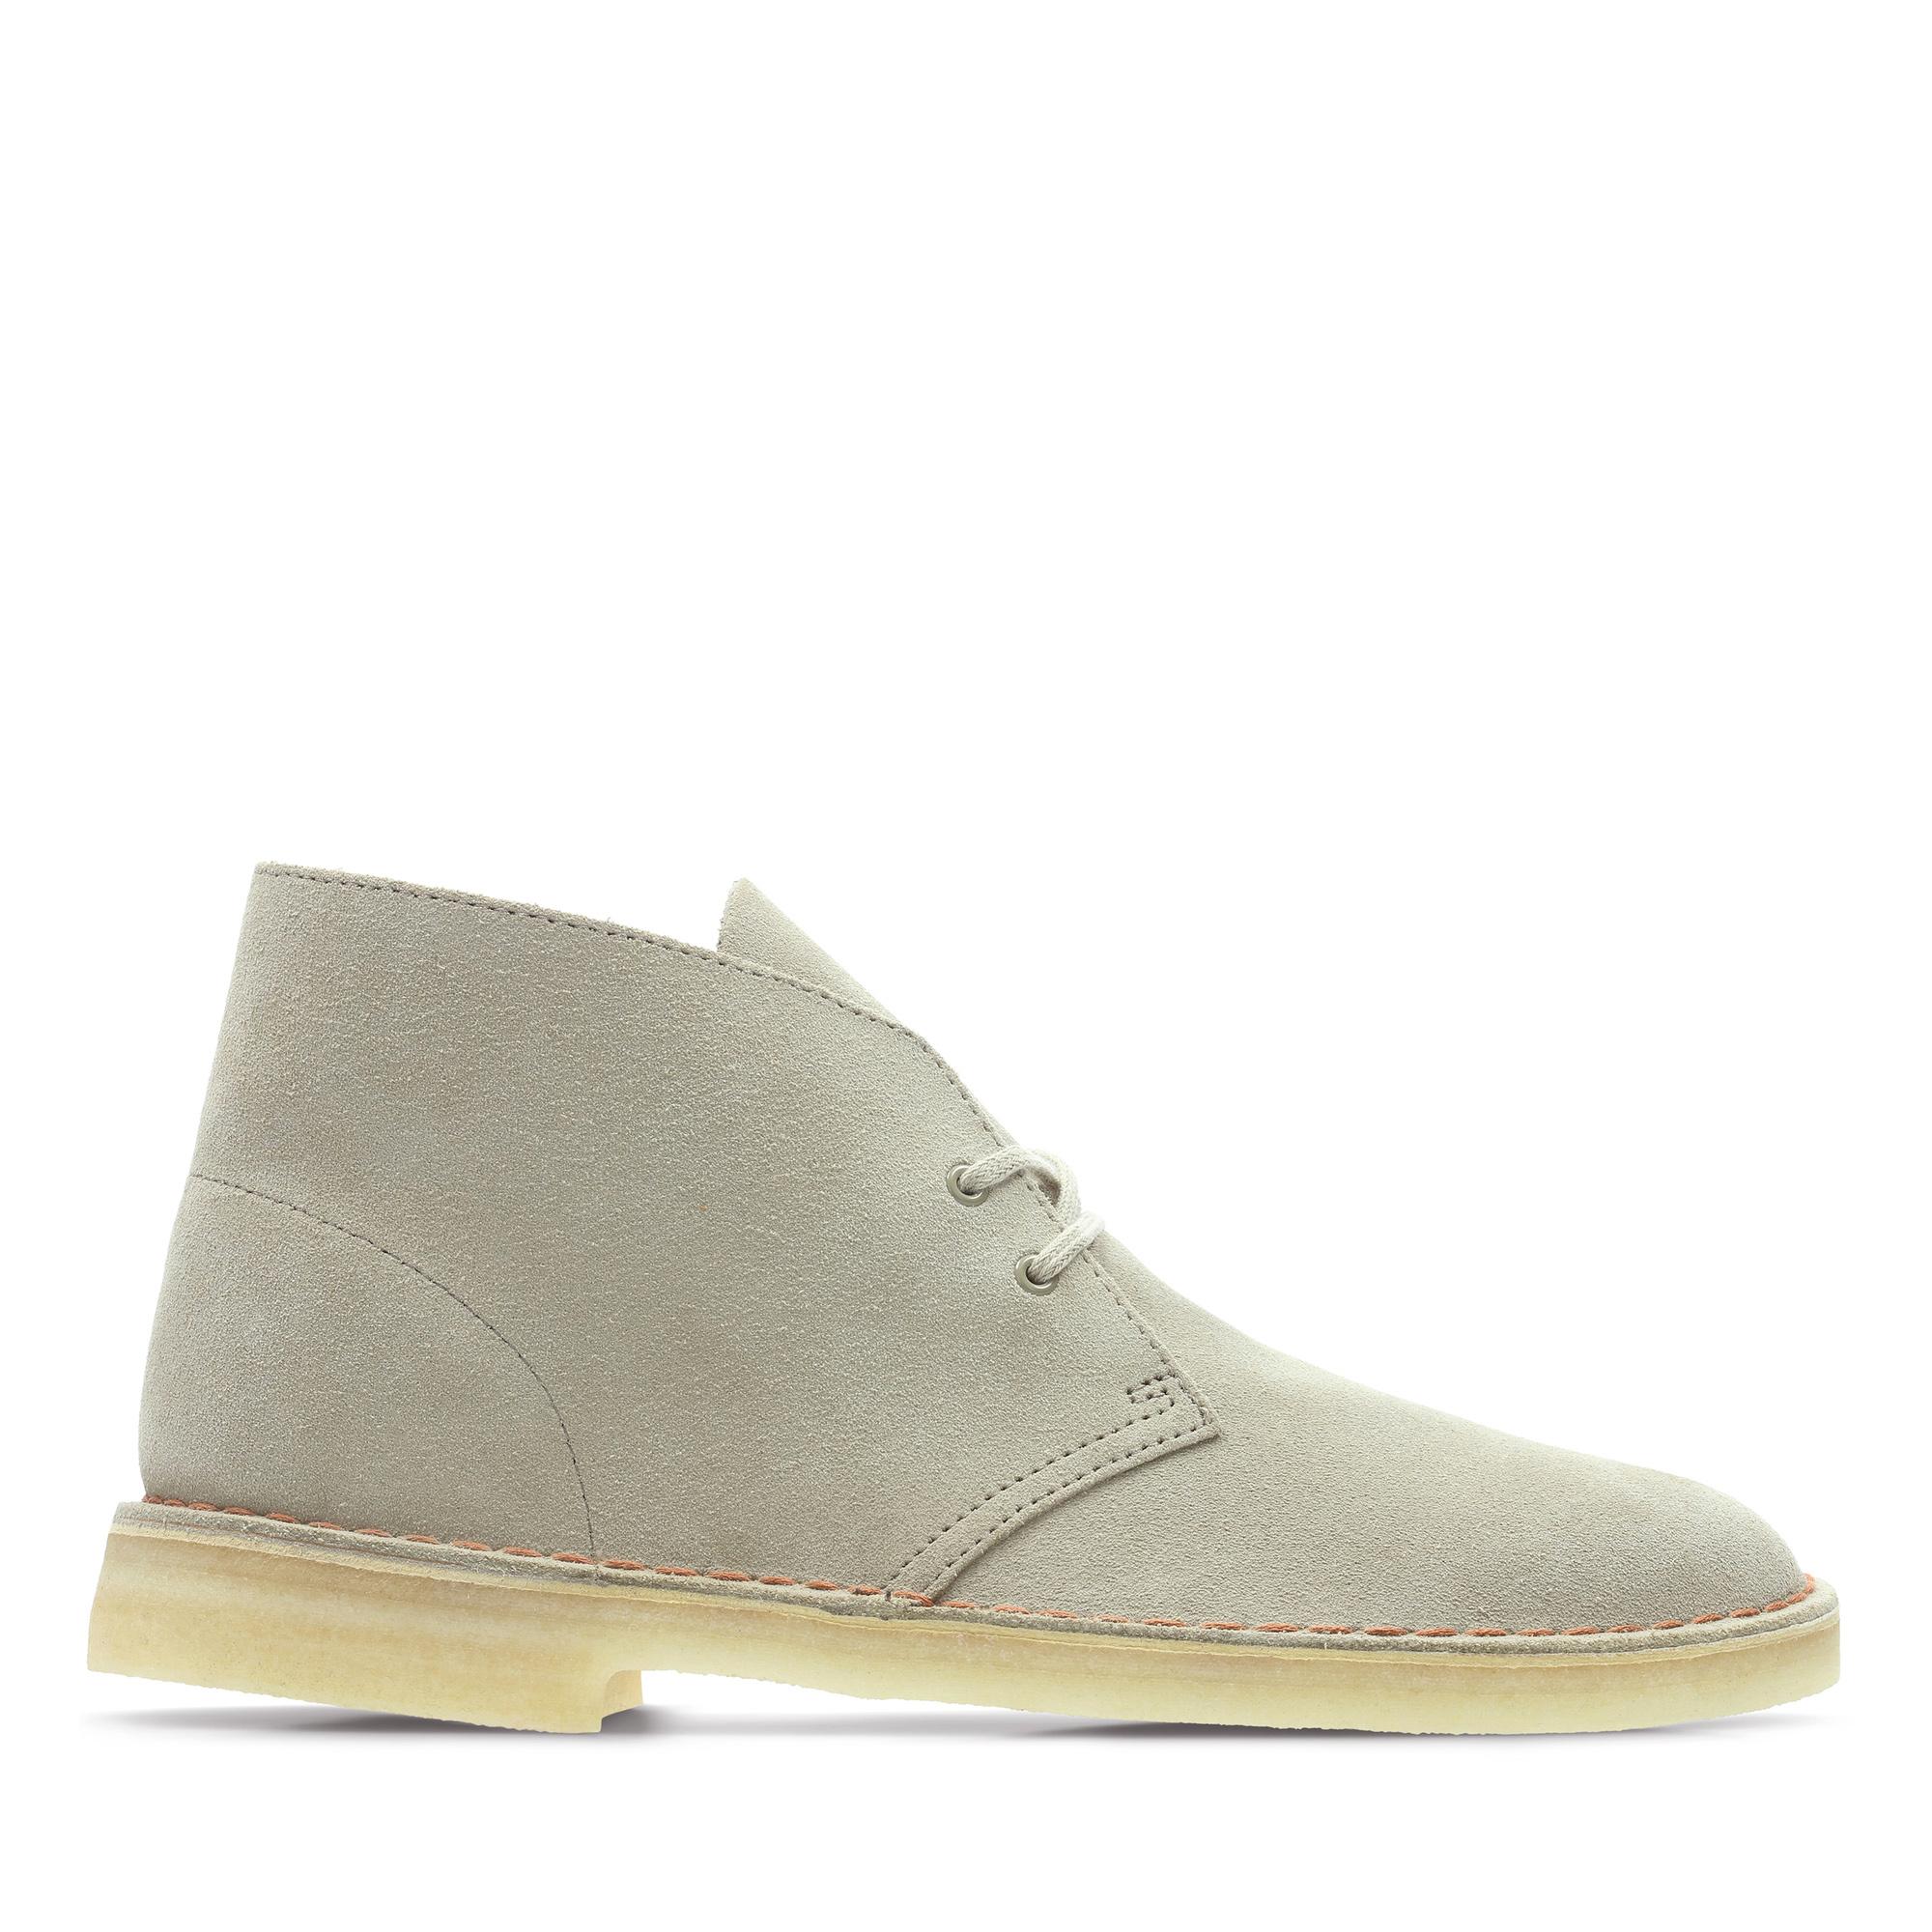 Damen Clarks Originals Desert Boot Stiefeletten /& Boots Blau